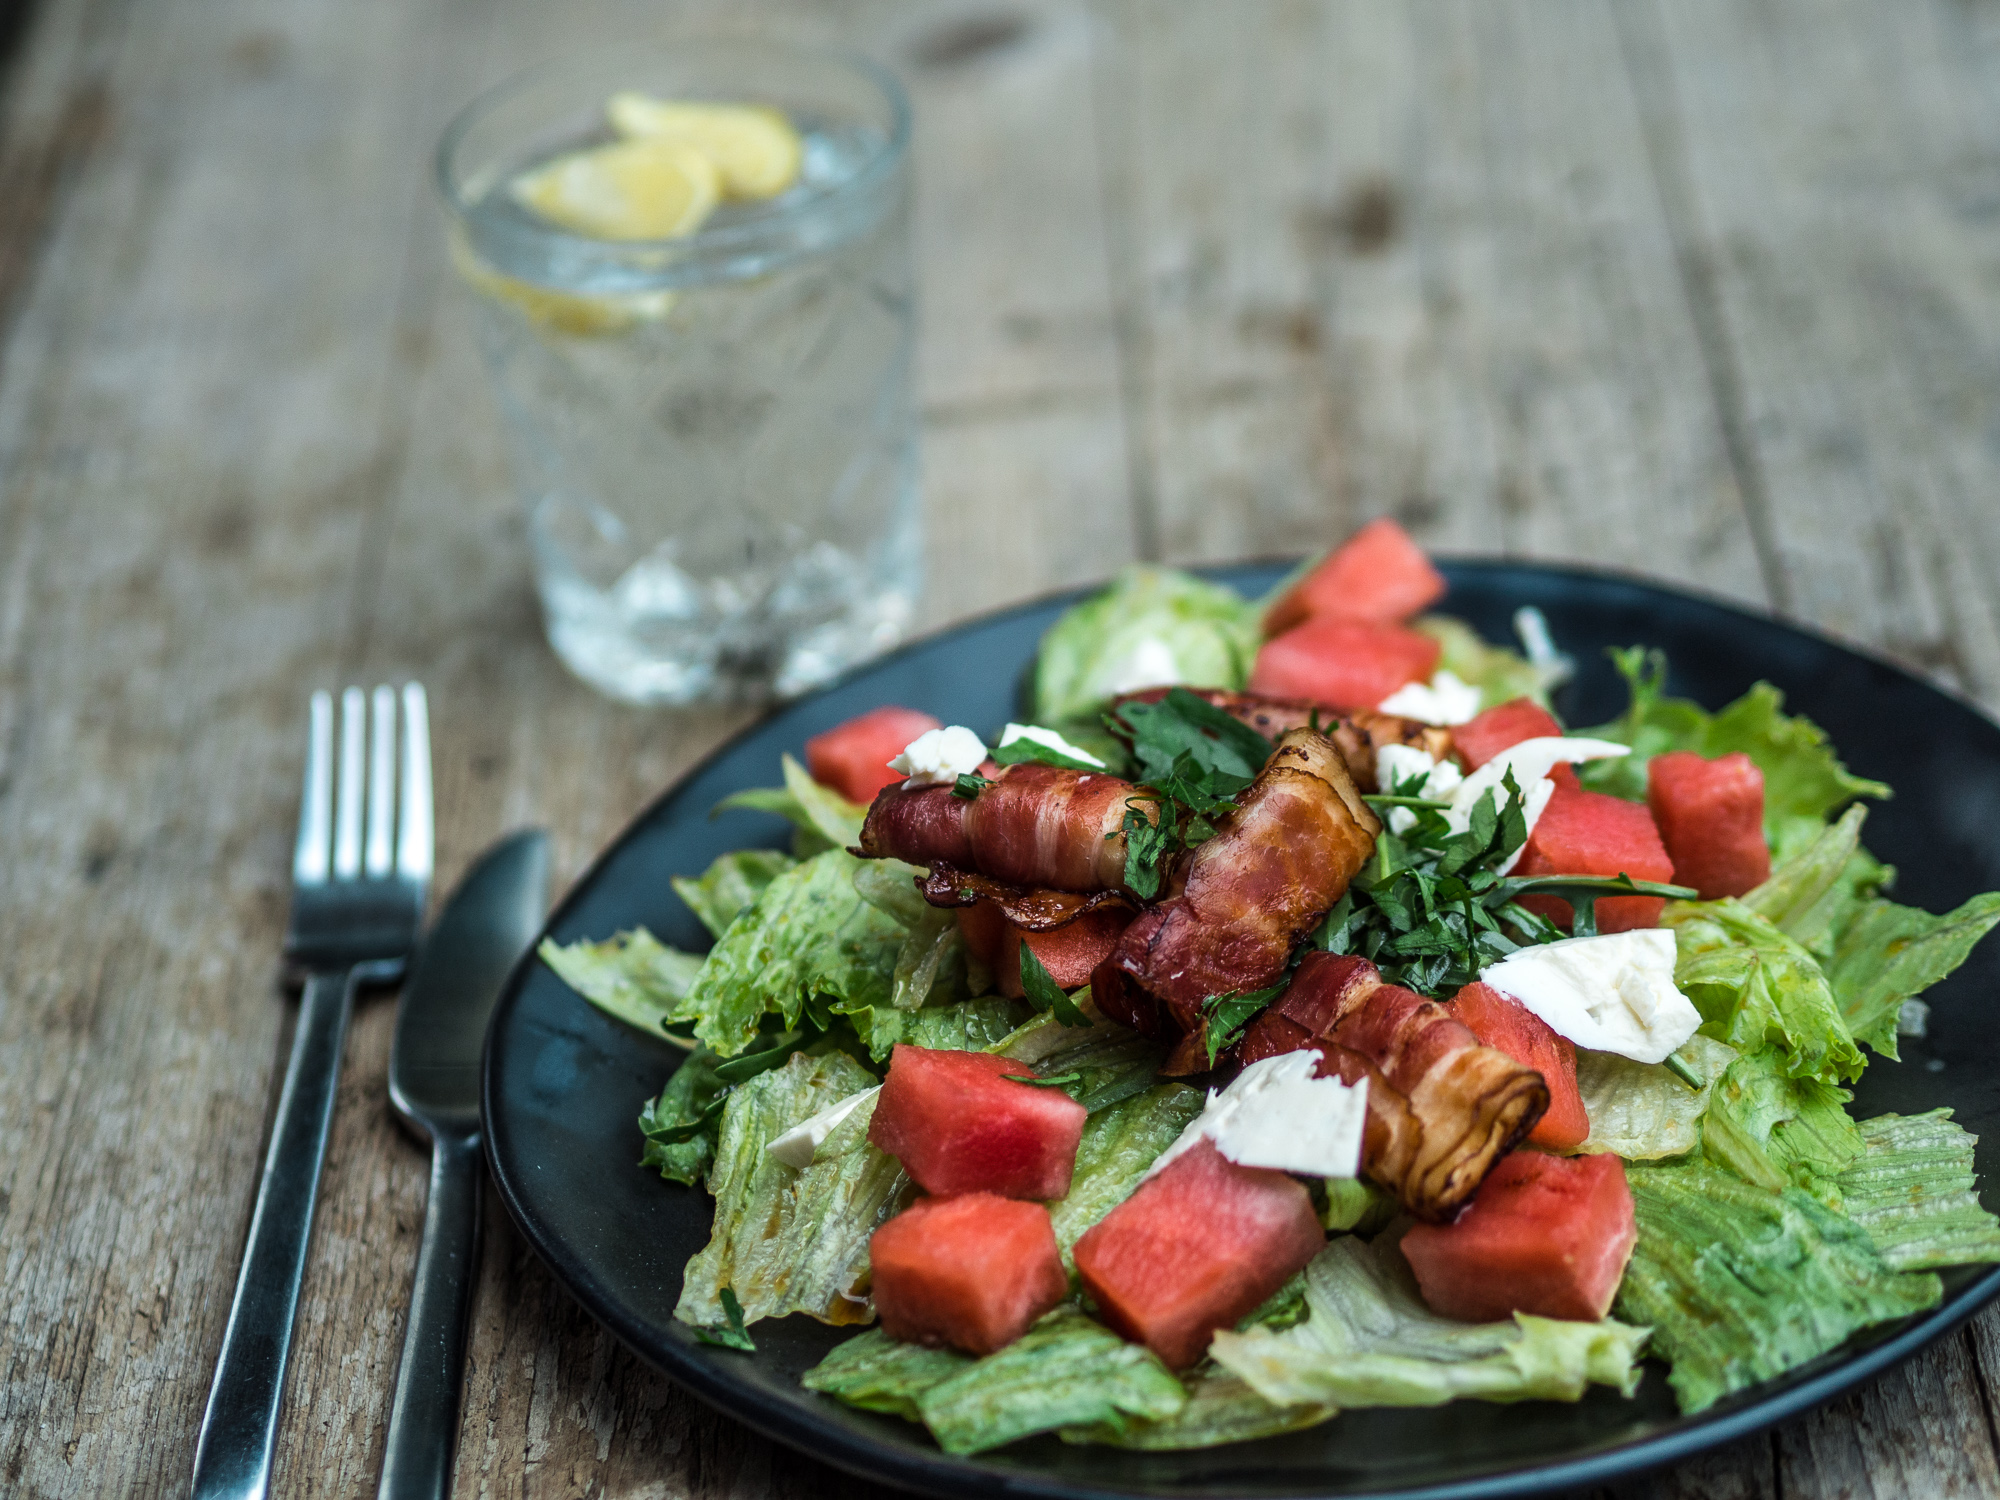 Wassermelonensalat, Salat mit Wassermelonen, Fetasalat, Speck, Melonensalat, Salat, Rezept, gesund, Low Carb, www.lakatyfox.com